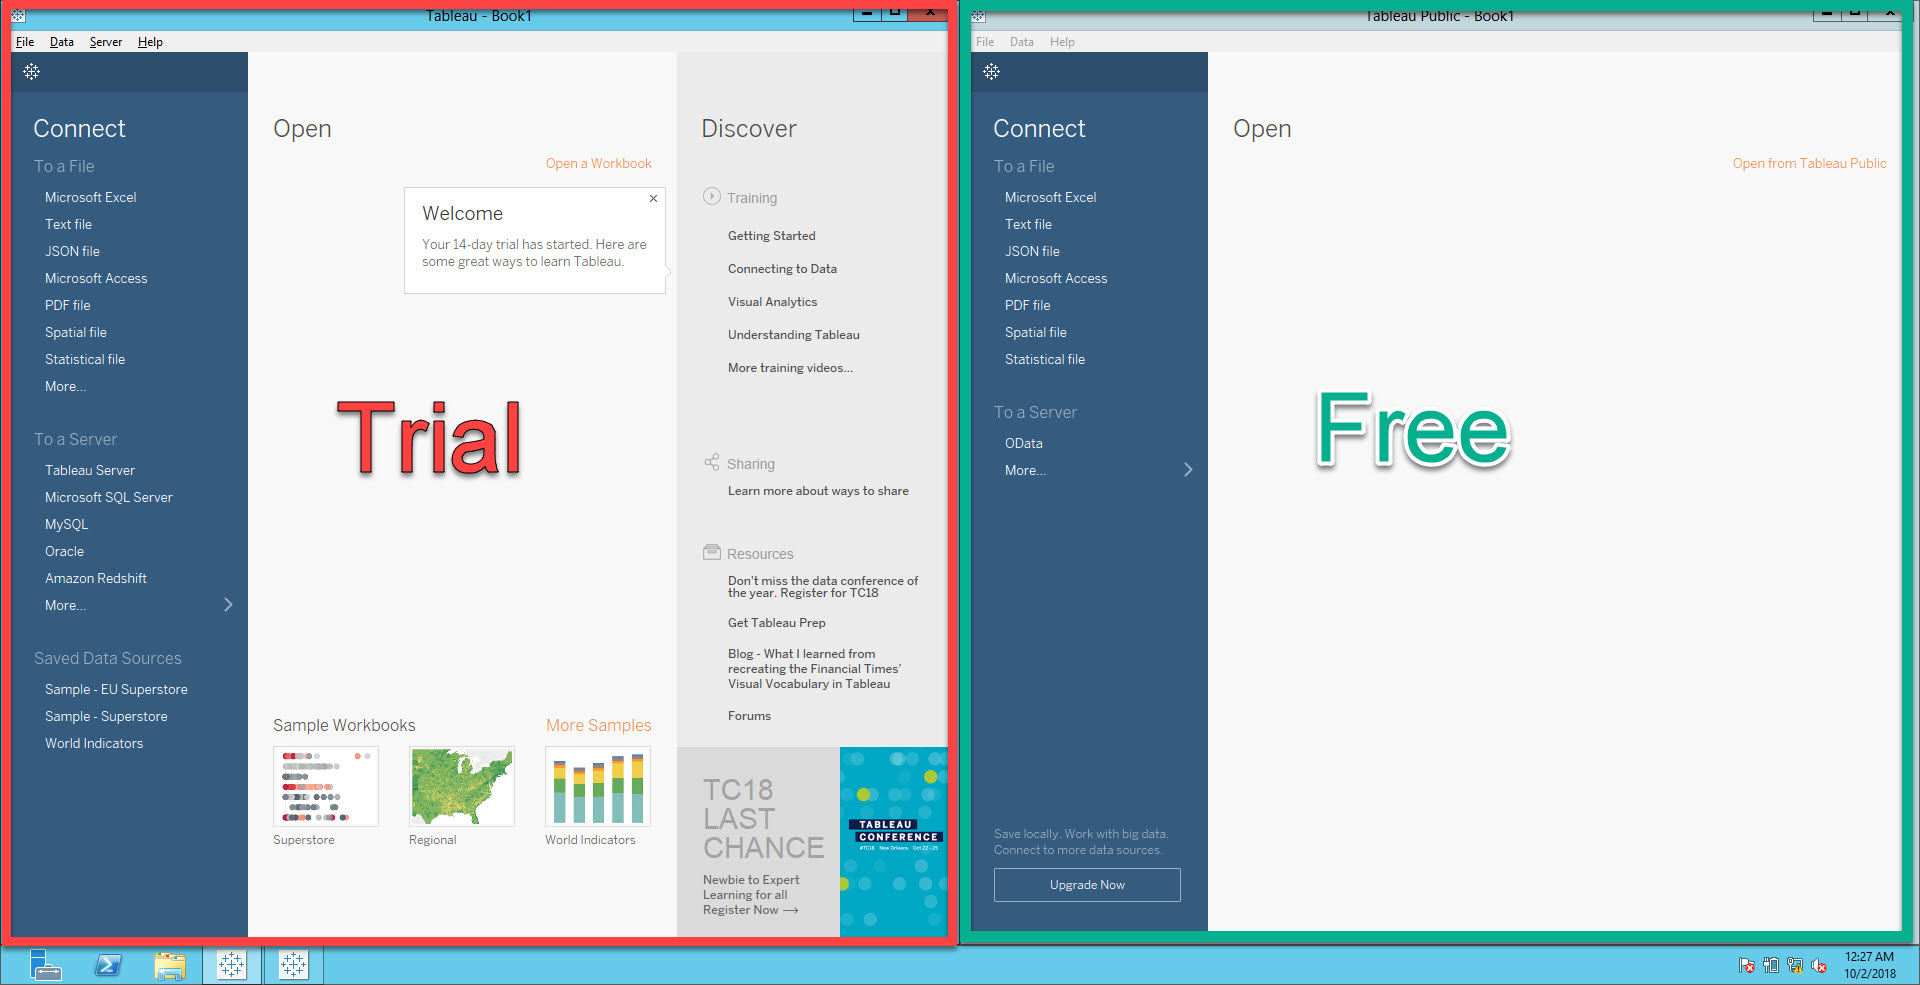 Tableau Desktop User Interface Explained - vLemon com